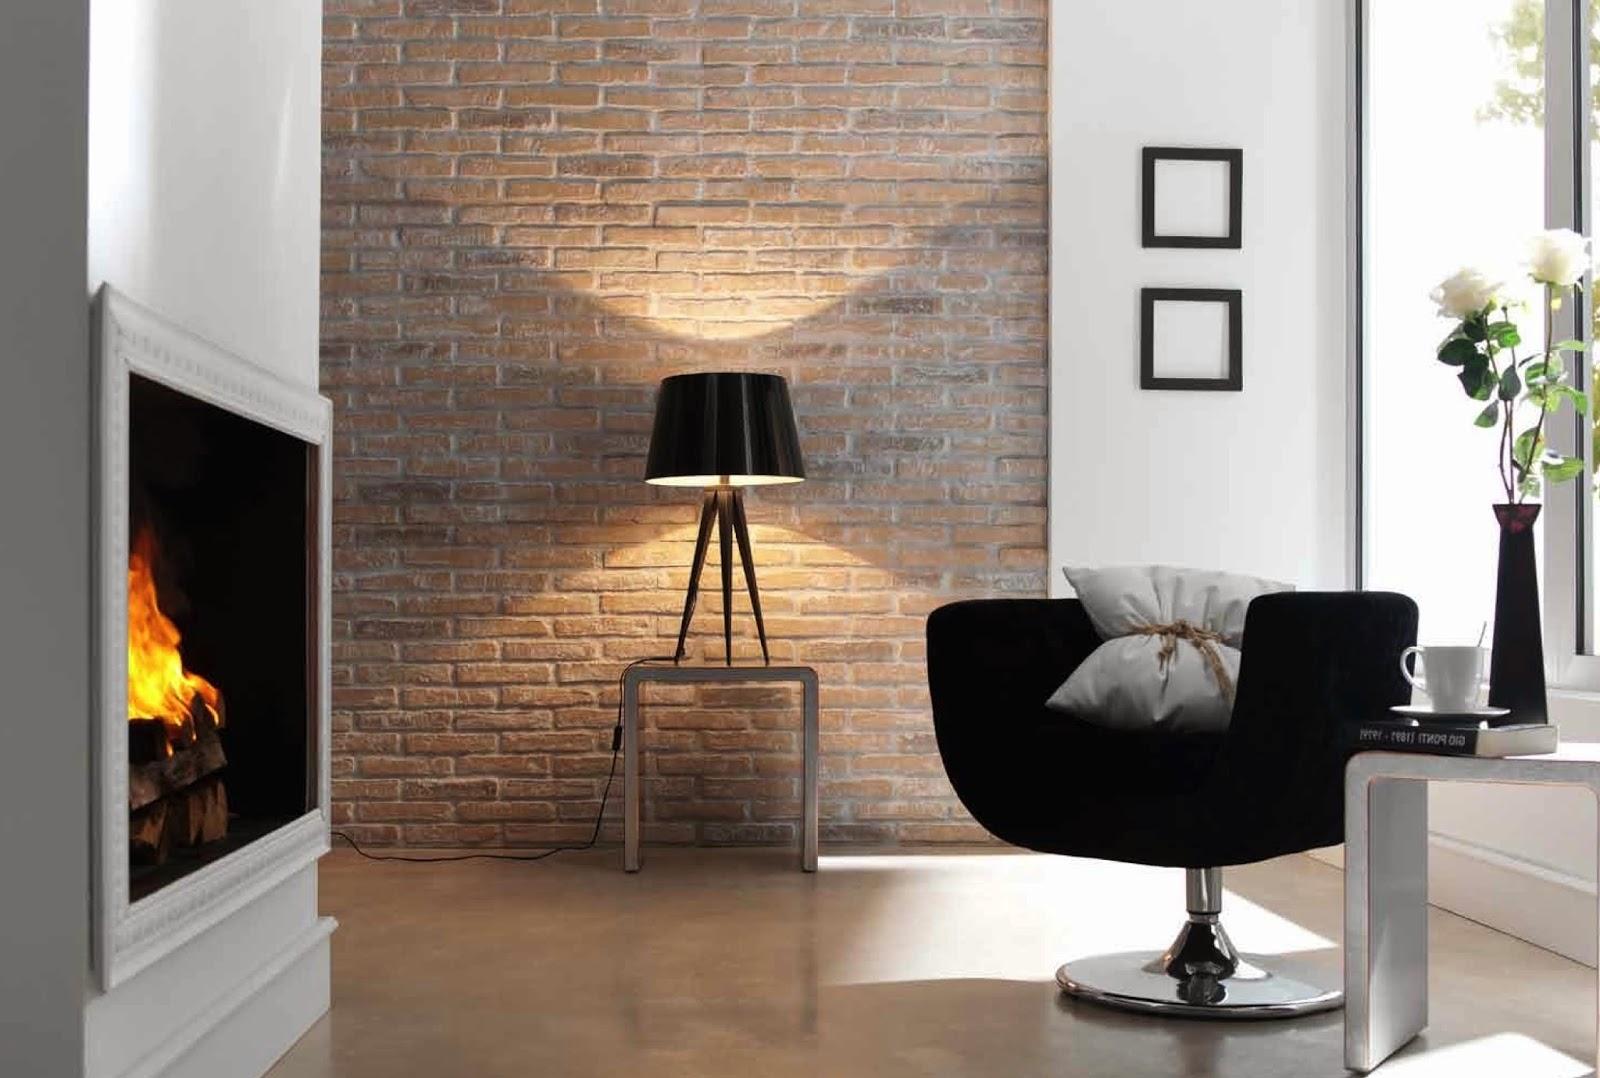 Подсветка стены лампой